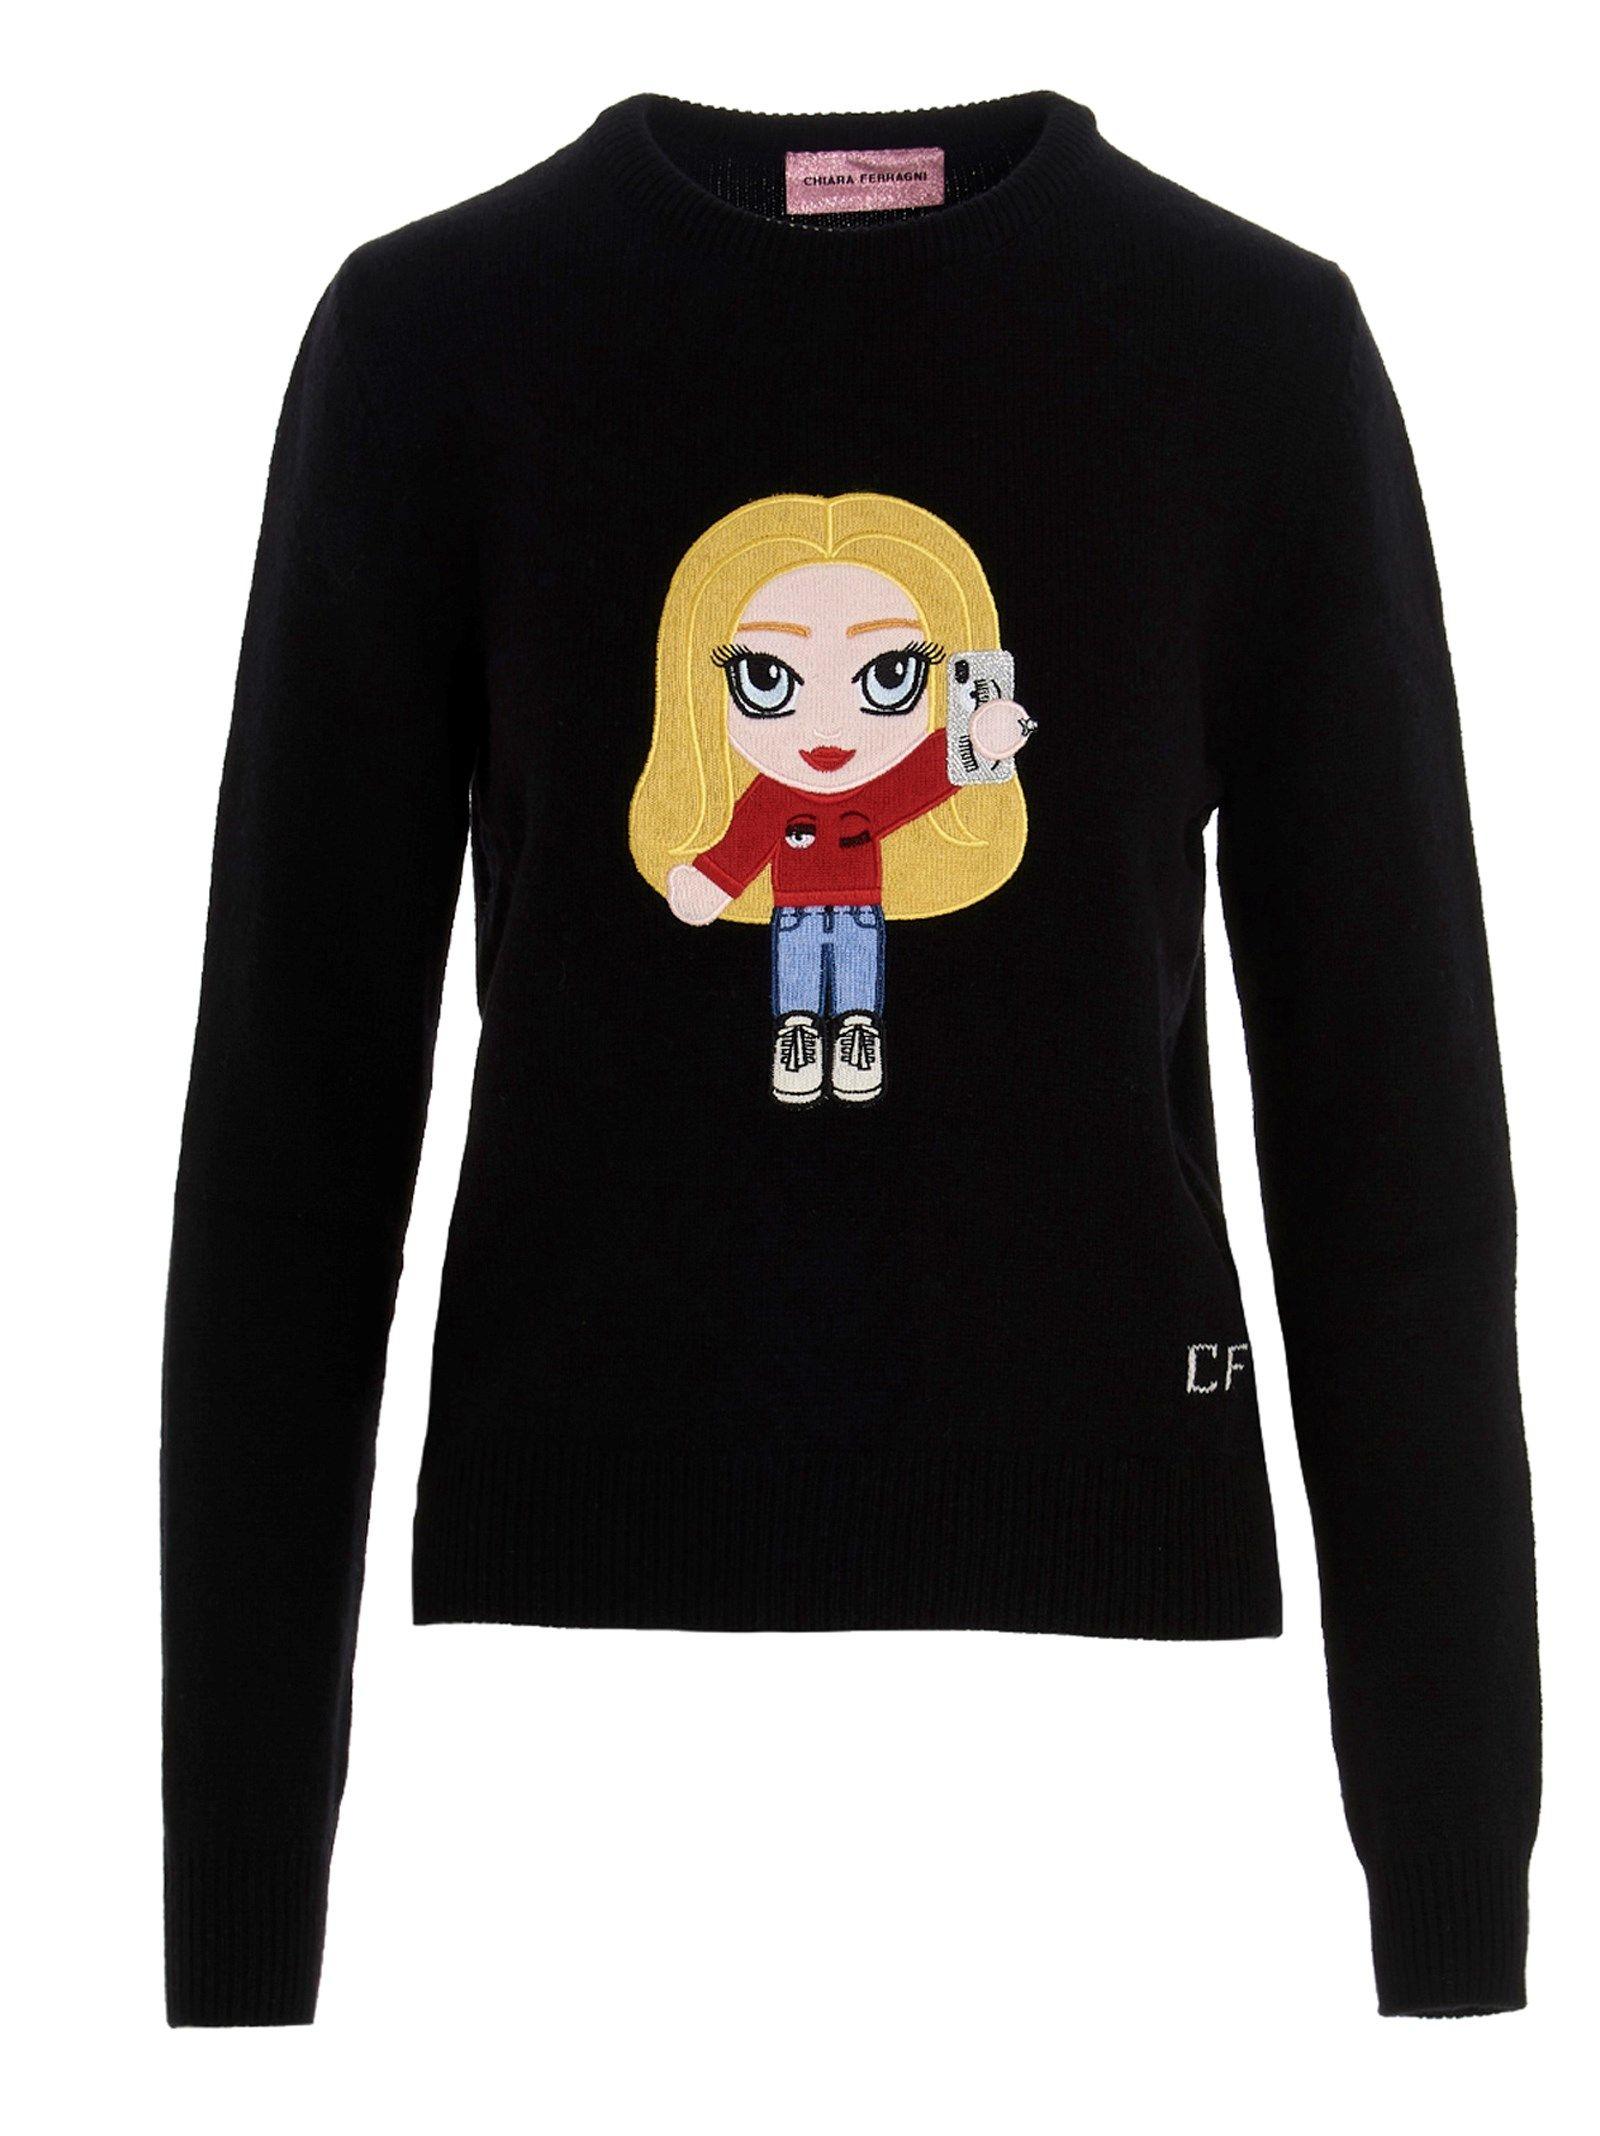 Chiara Ferragni Sweaters CHIARA FERRAGNI WOMEN'S BLACK OTHER MATERIALS SWEATER